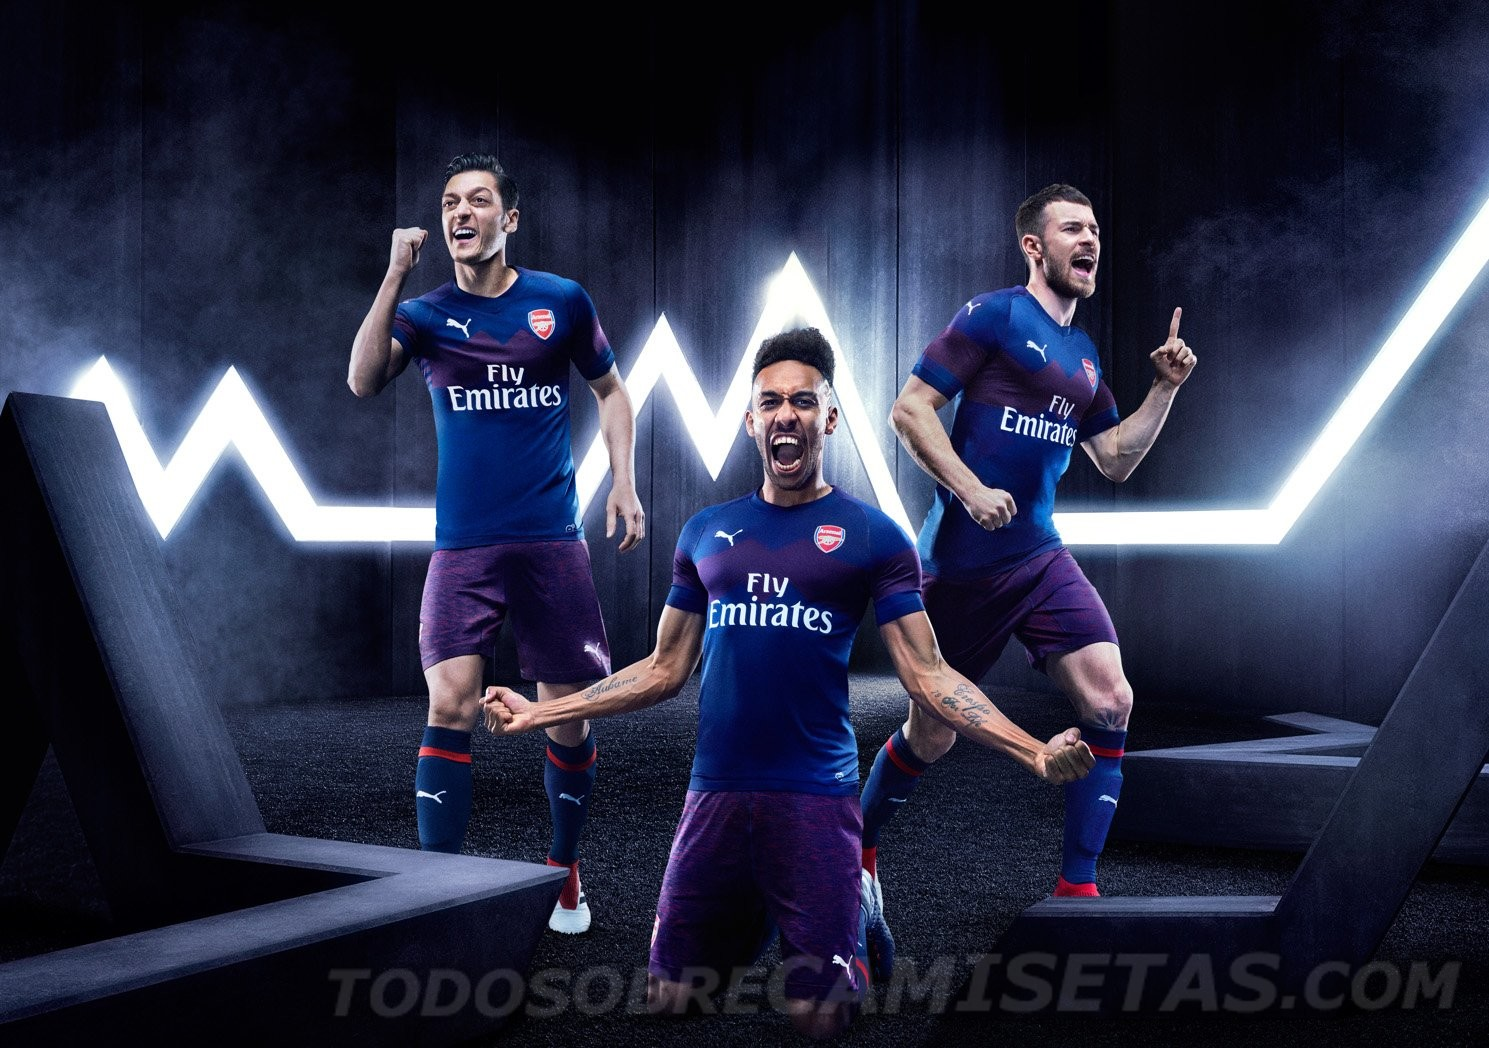 Arsenal 2019 maillot extérieur